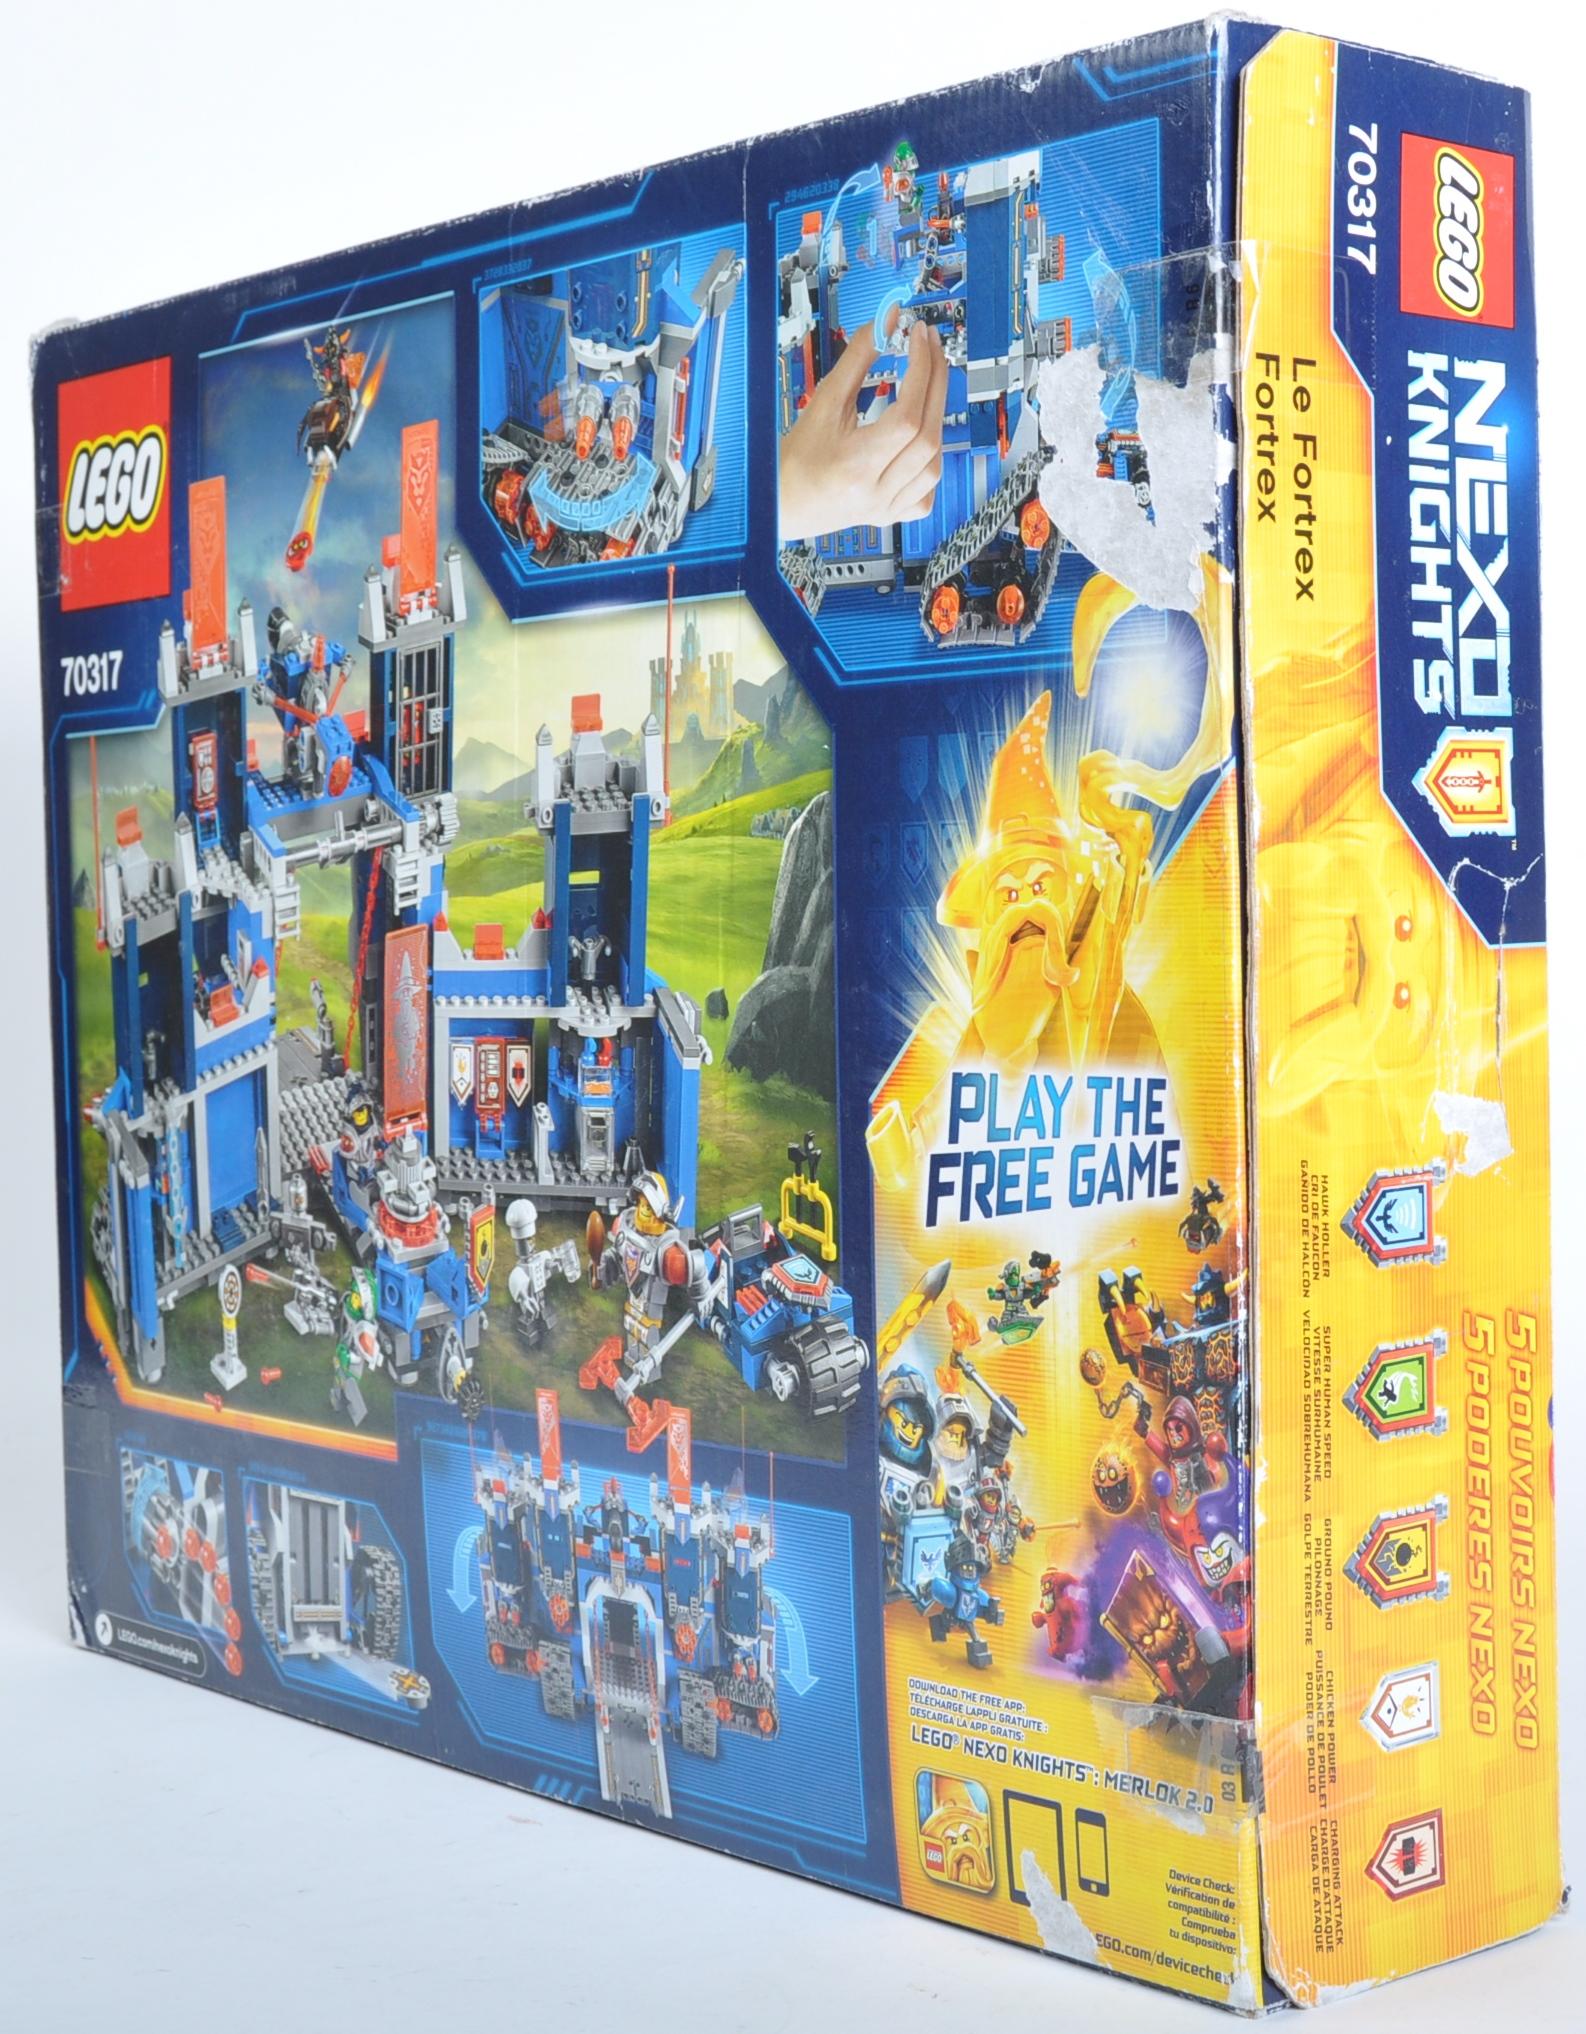 LEGO SET - LEGO NEXO KNIGHTS - 70317 THE FORTREX - Image 3 of 4